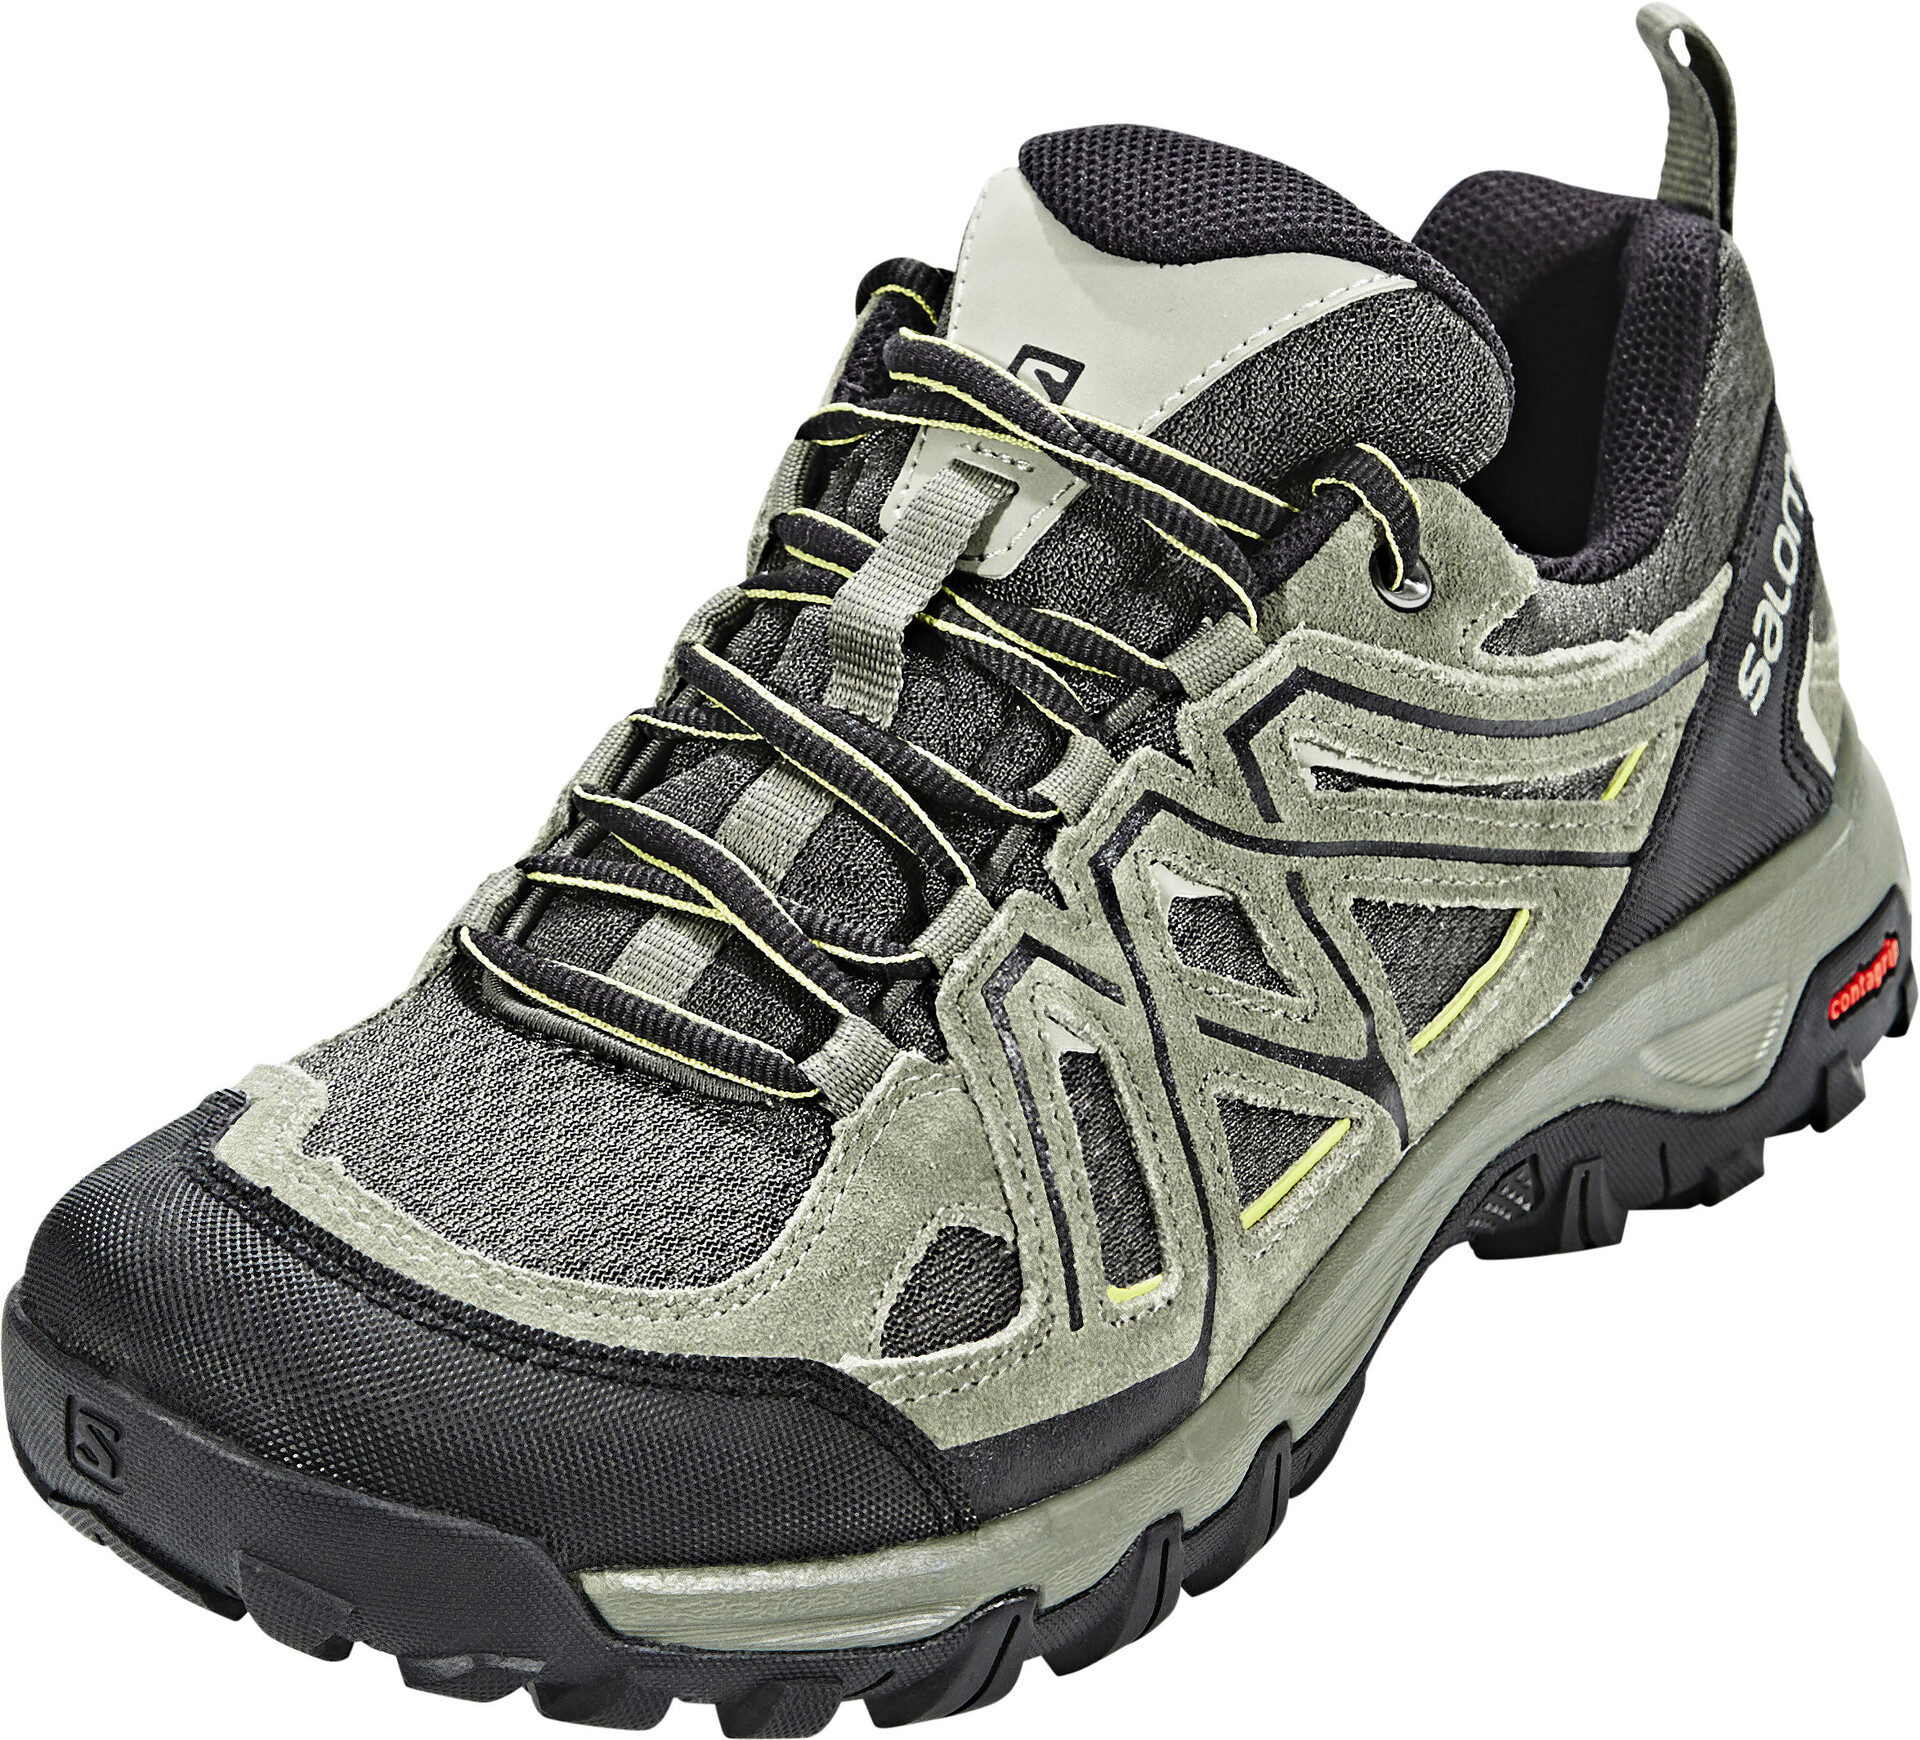 SALOMON Mens Evasion 2 Aero Hiking Shoe